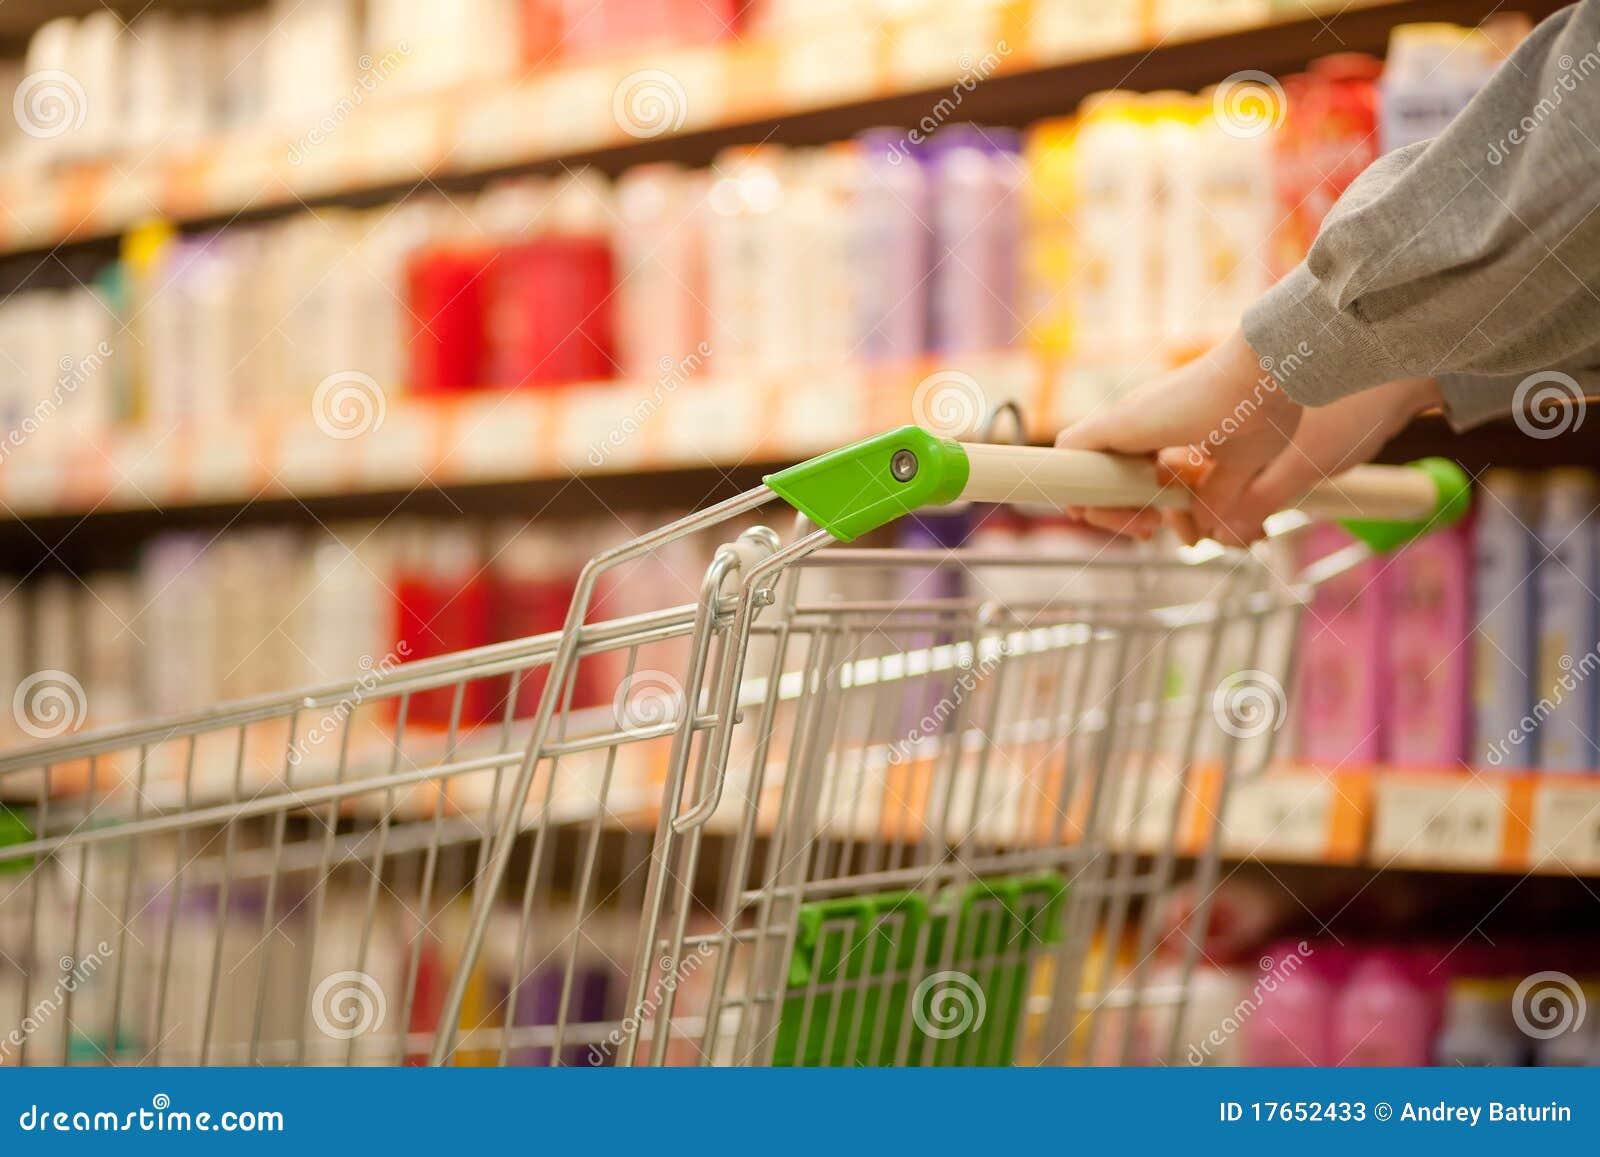 Shopping cart in supermarket